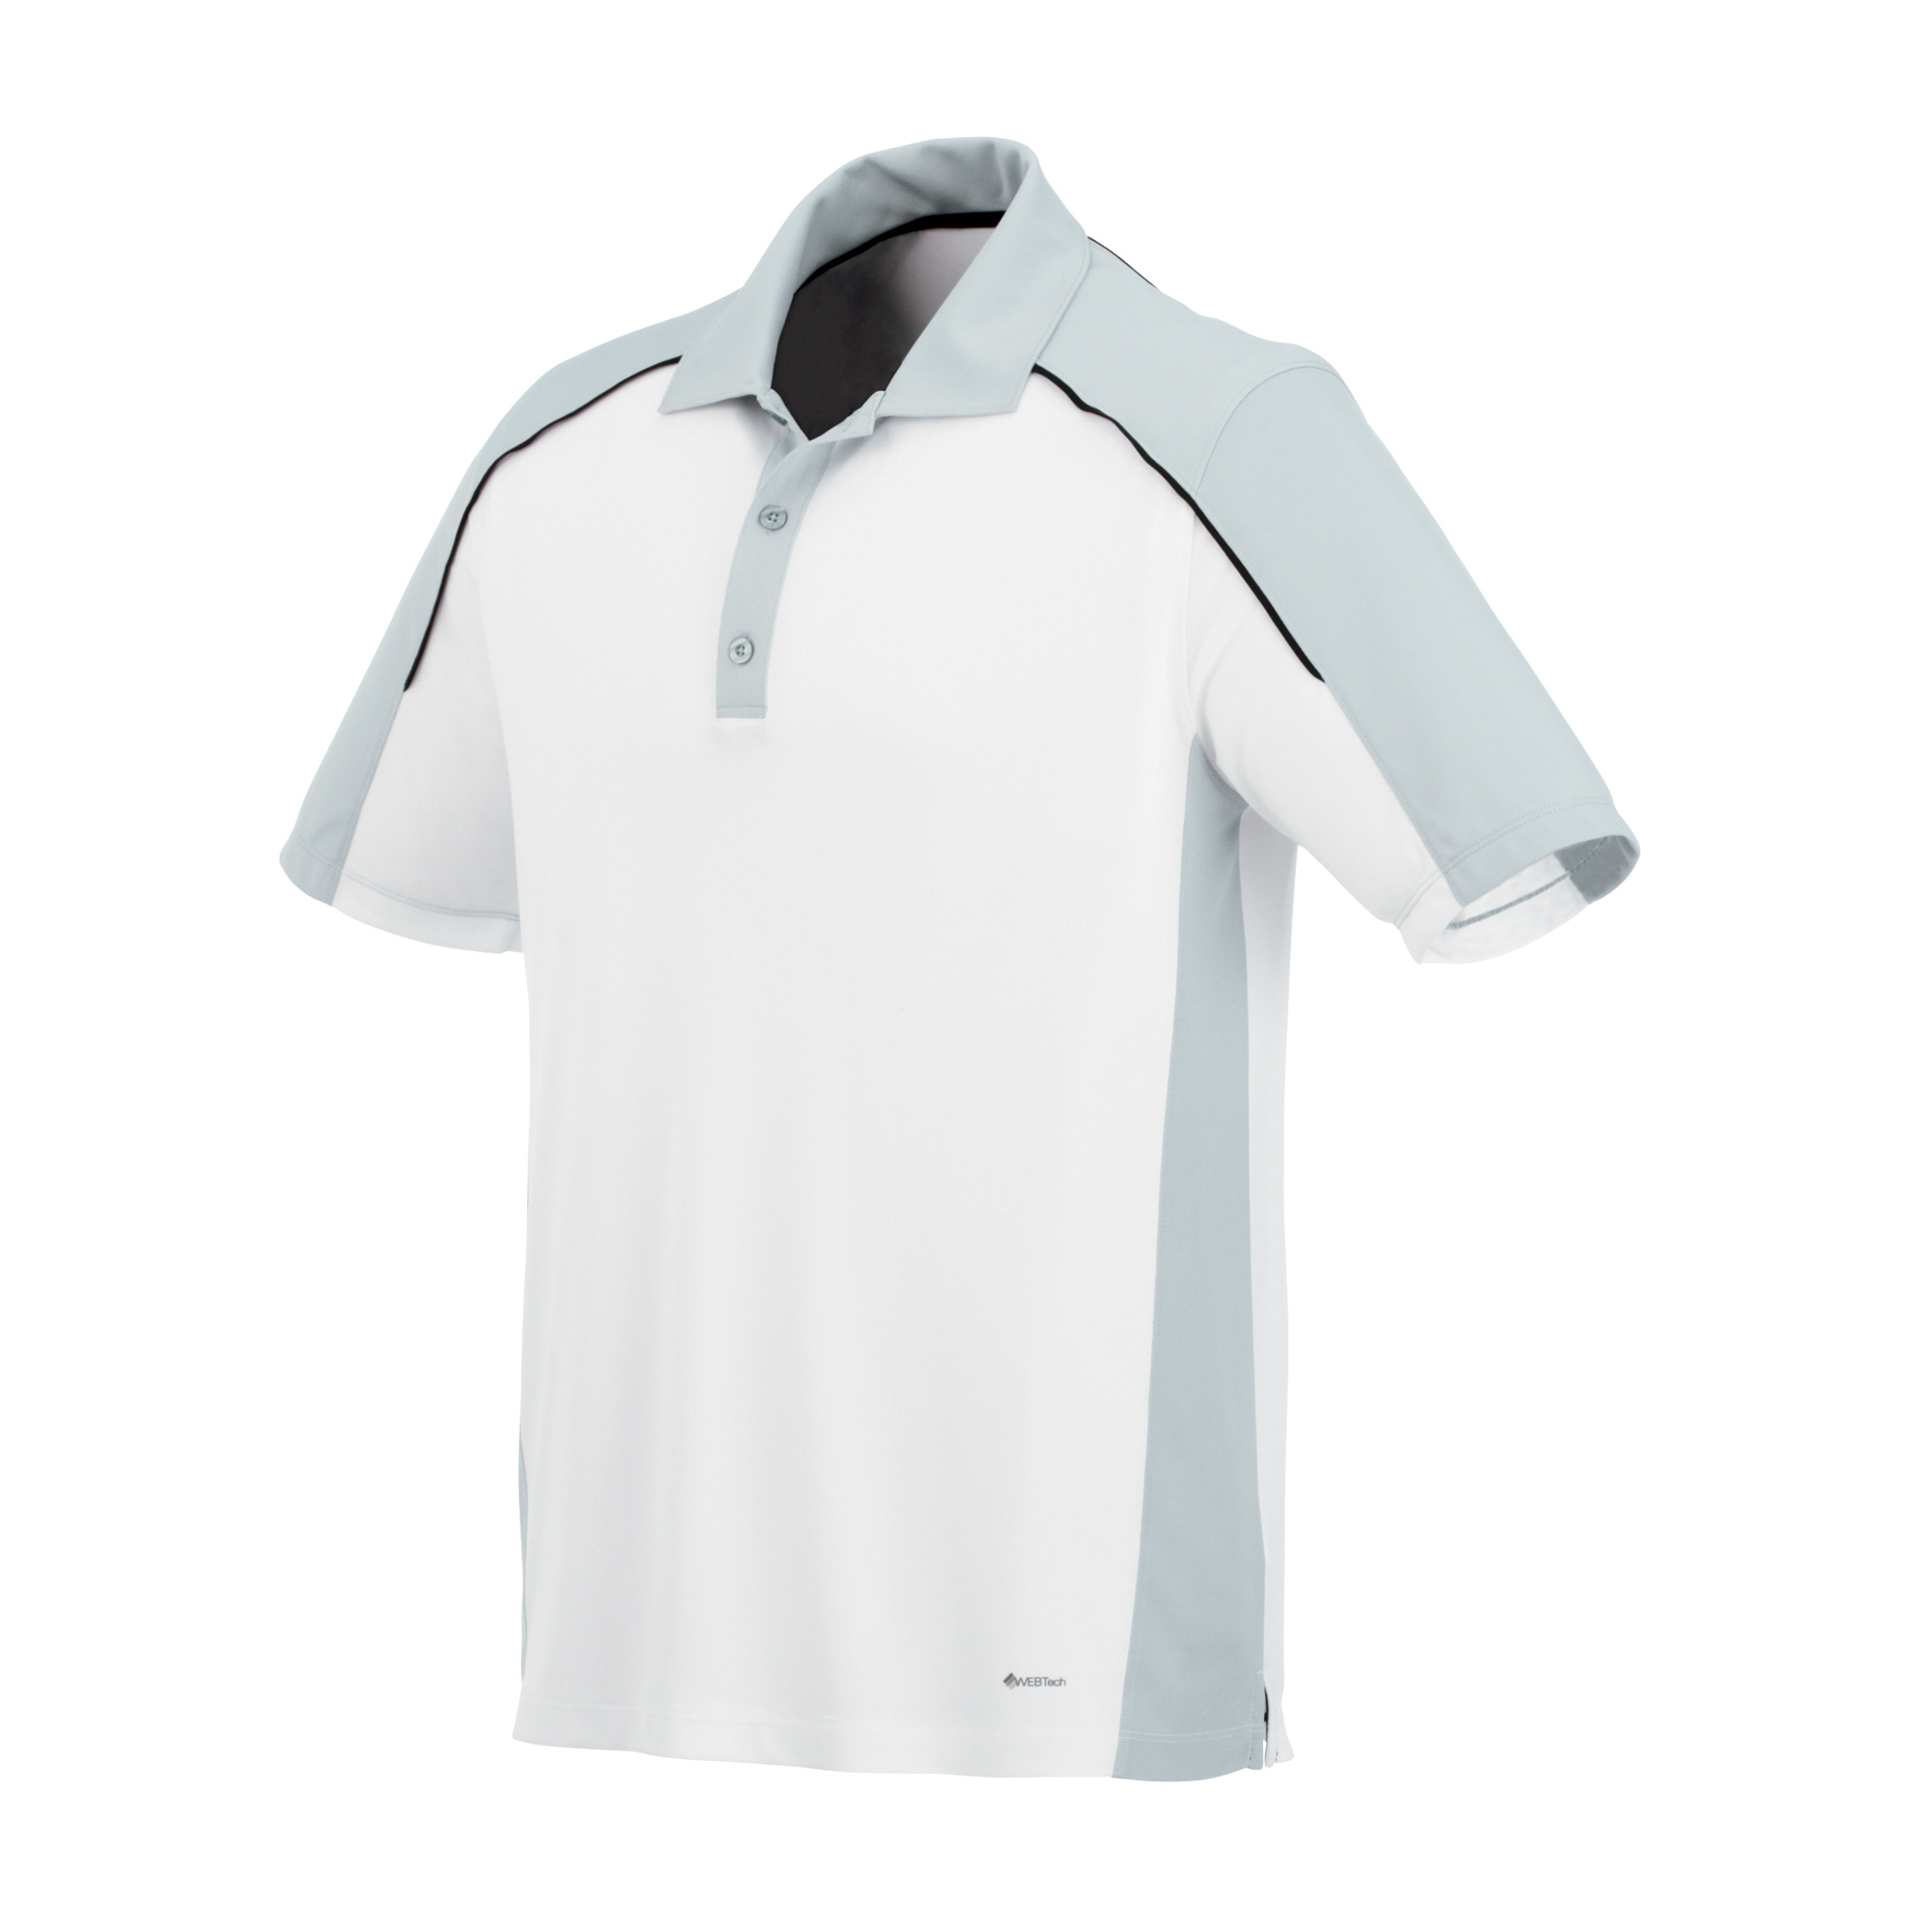 ed8f2f948 M) MARTIS Short sleeve polo Trimark Sportswear Group